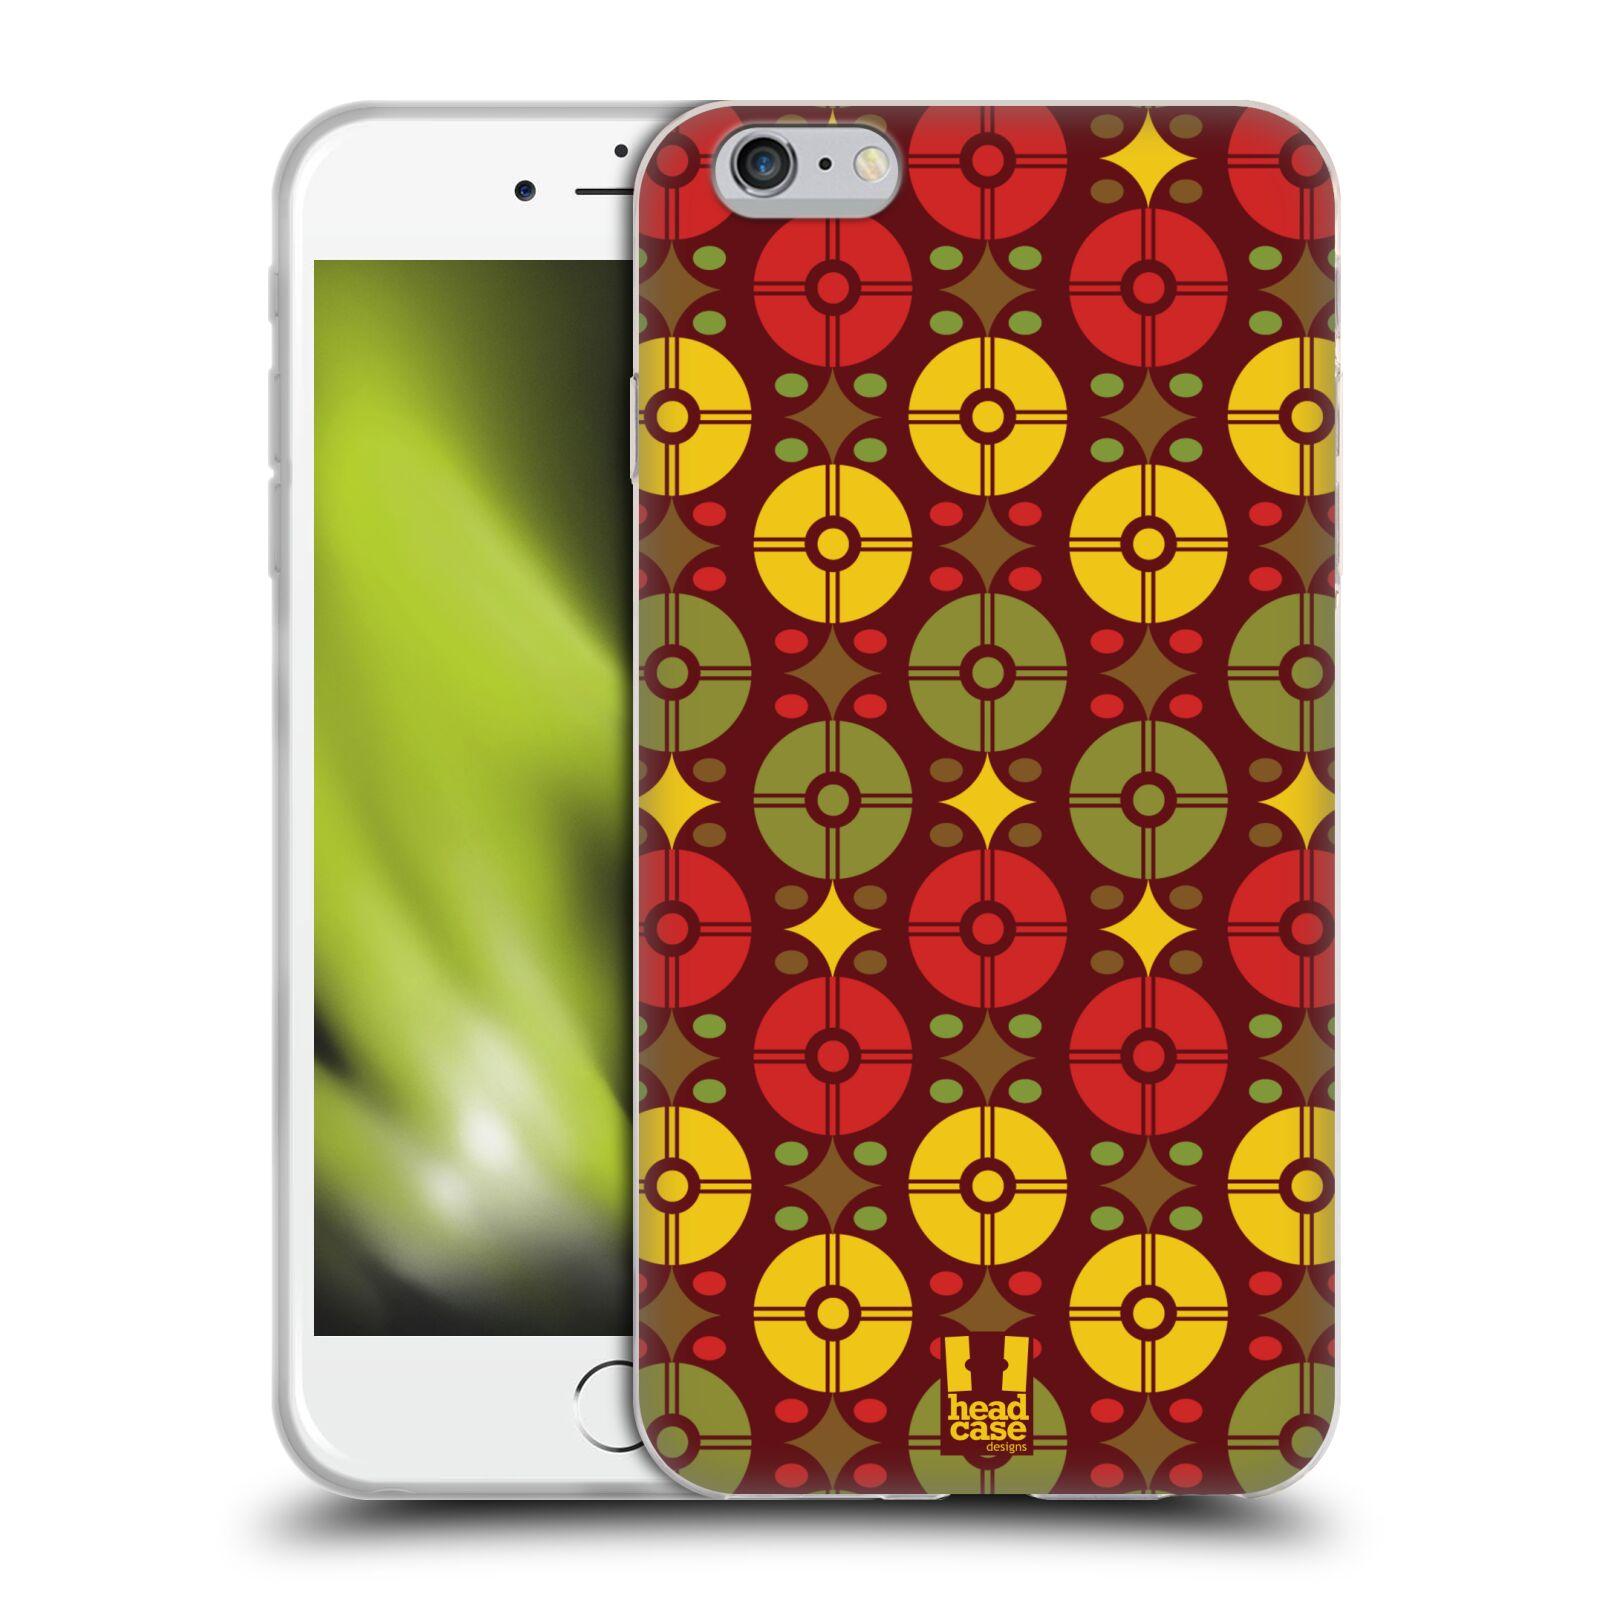 HEAD CASE silikonový obal na mobil Apple Iphone 6 PLUS/ 6S PLUS vzor Africké motivy OMÁMENÍ